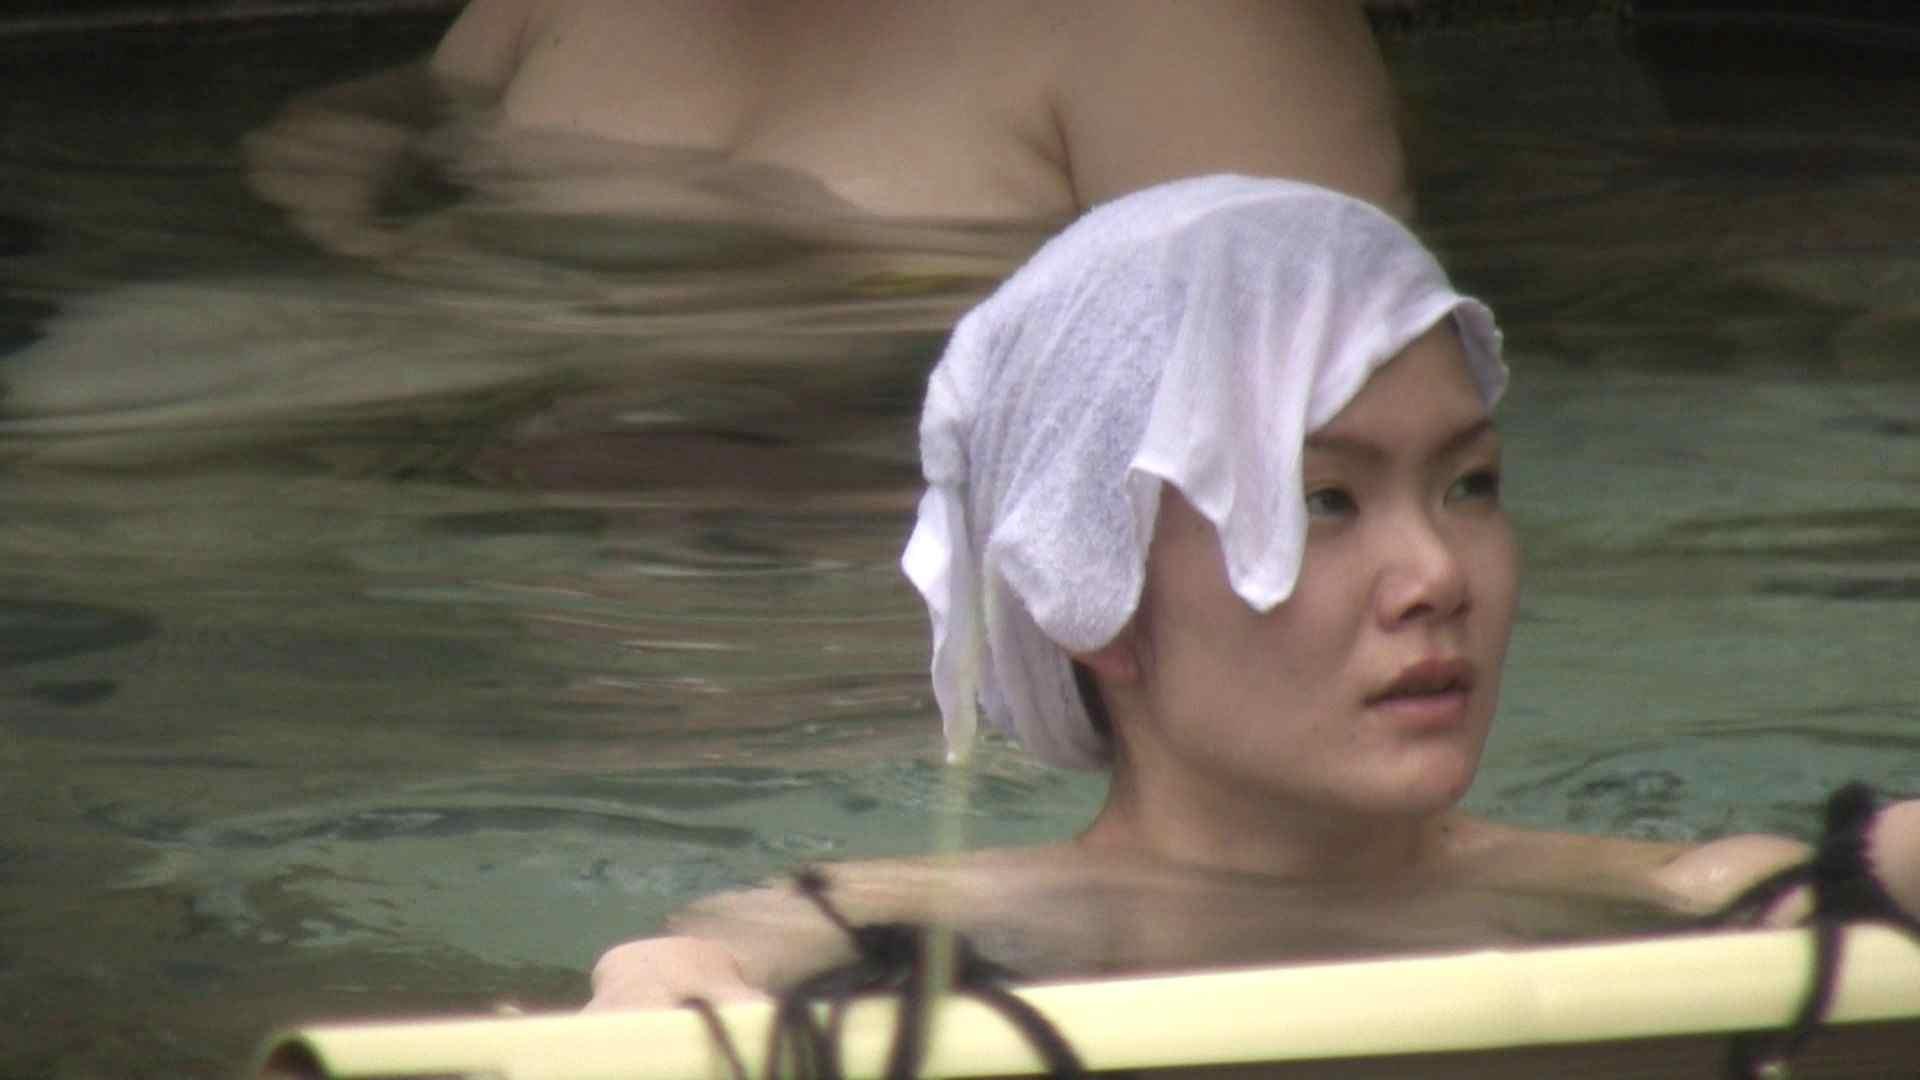 Aquaな露天風呂Vol.12【VIP】 綺麗なOLたち | 盗撮  84枚 31